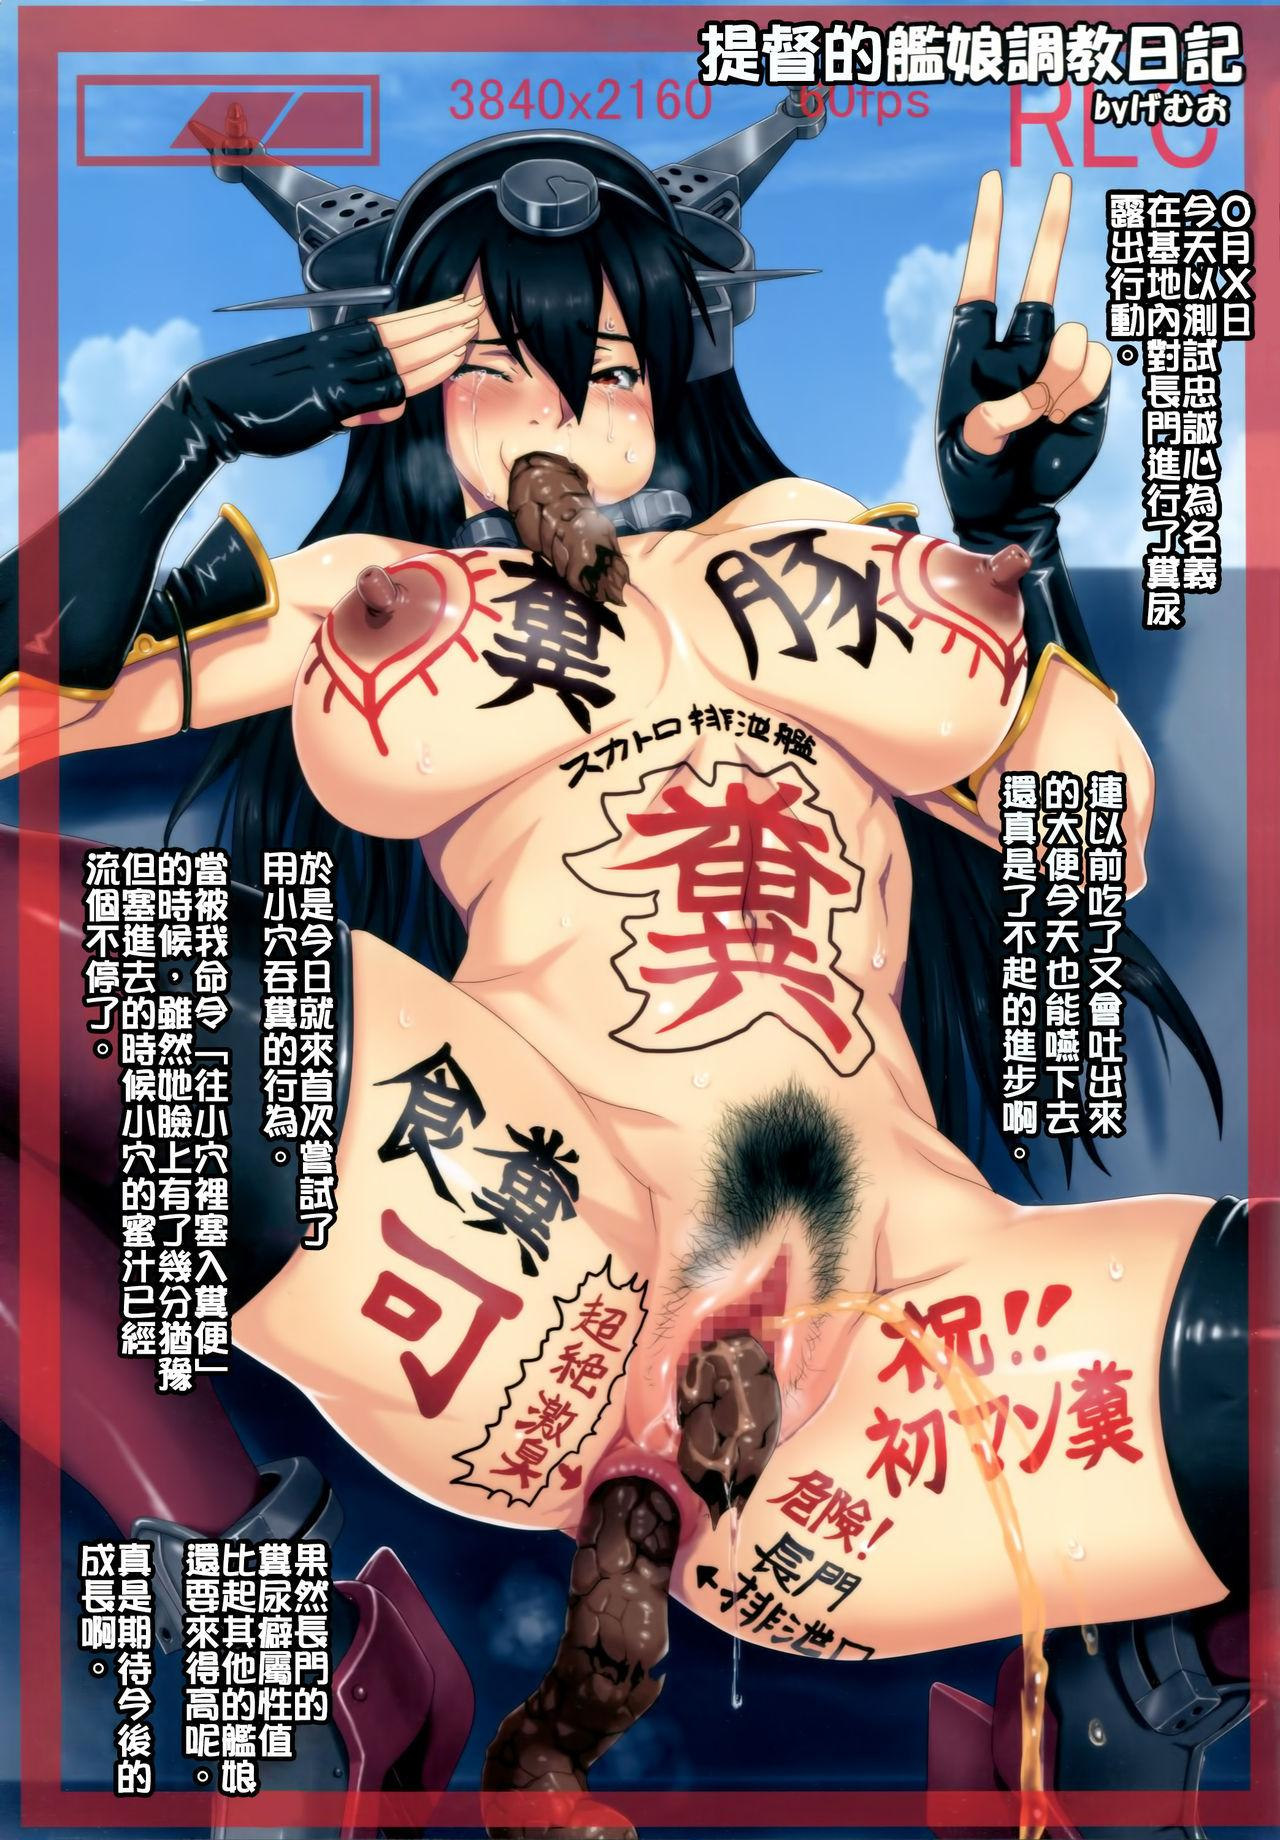 KanColle Haisetsu Sex Goudoushi LoveSca! Goudou Enshuu!! | 艦C排泄性交合同誌 激情糞便! 聯合演習!! 2